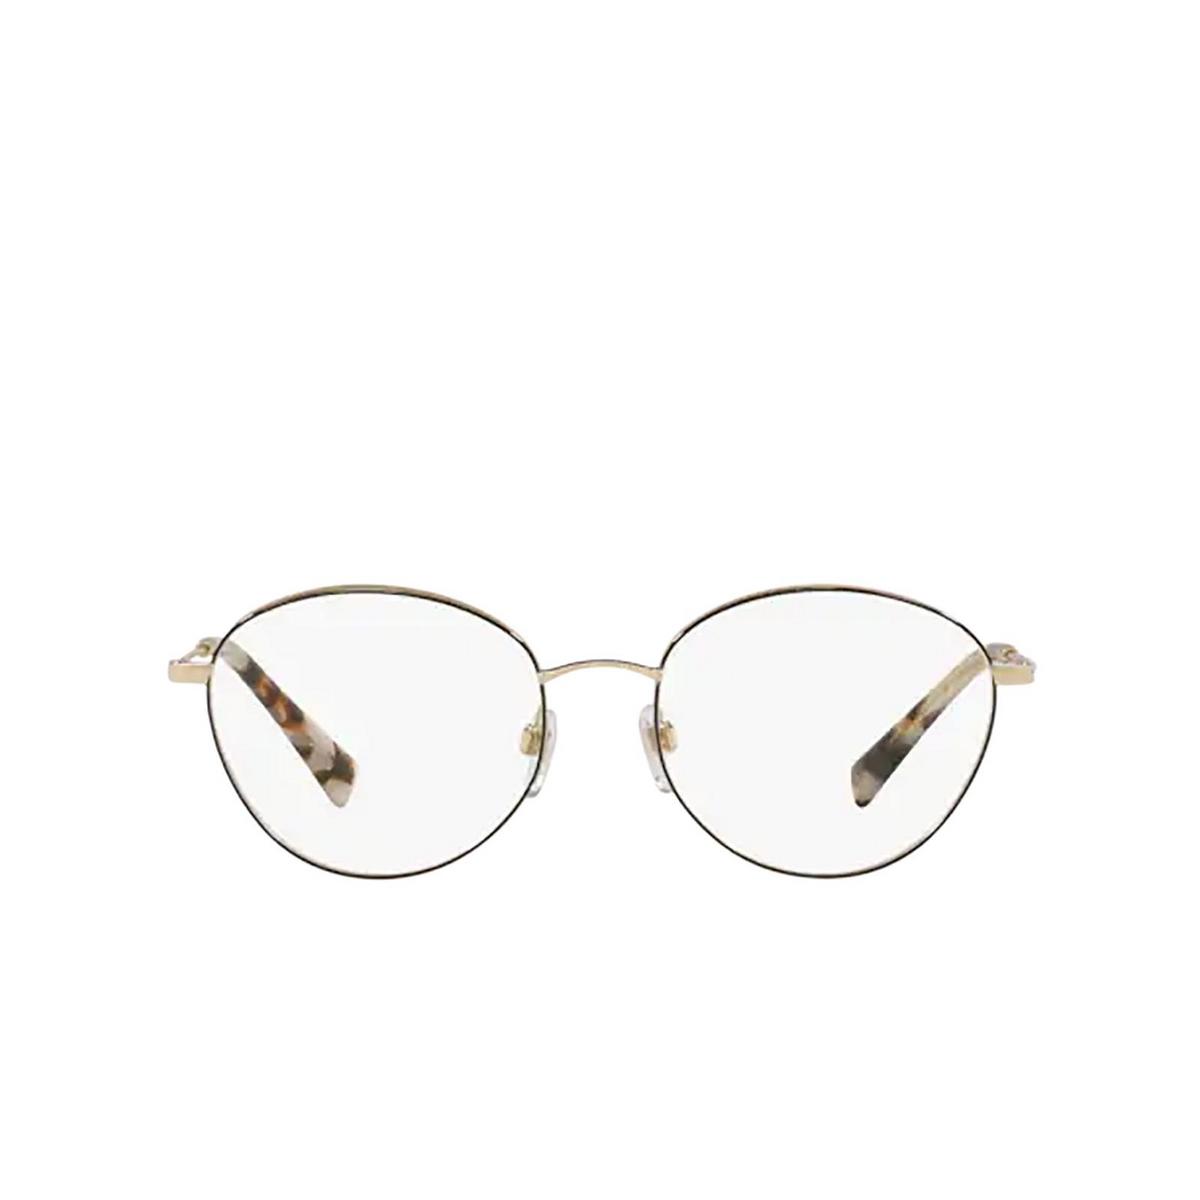 Valentino® Oval Eyeglasses: VA1003 color Pale Gold / Black 3003 - front view.